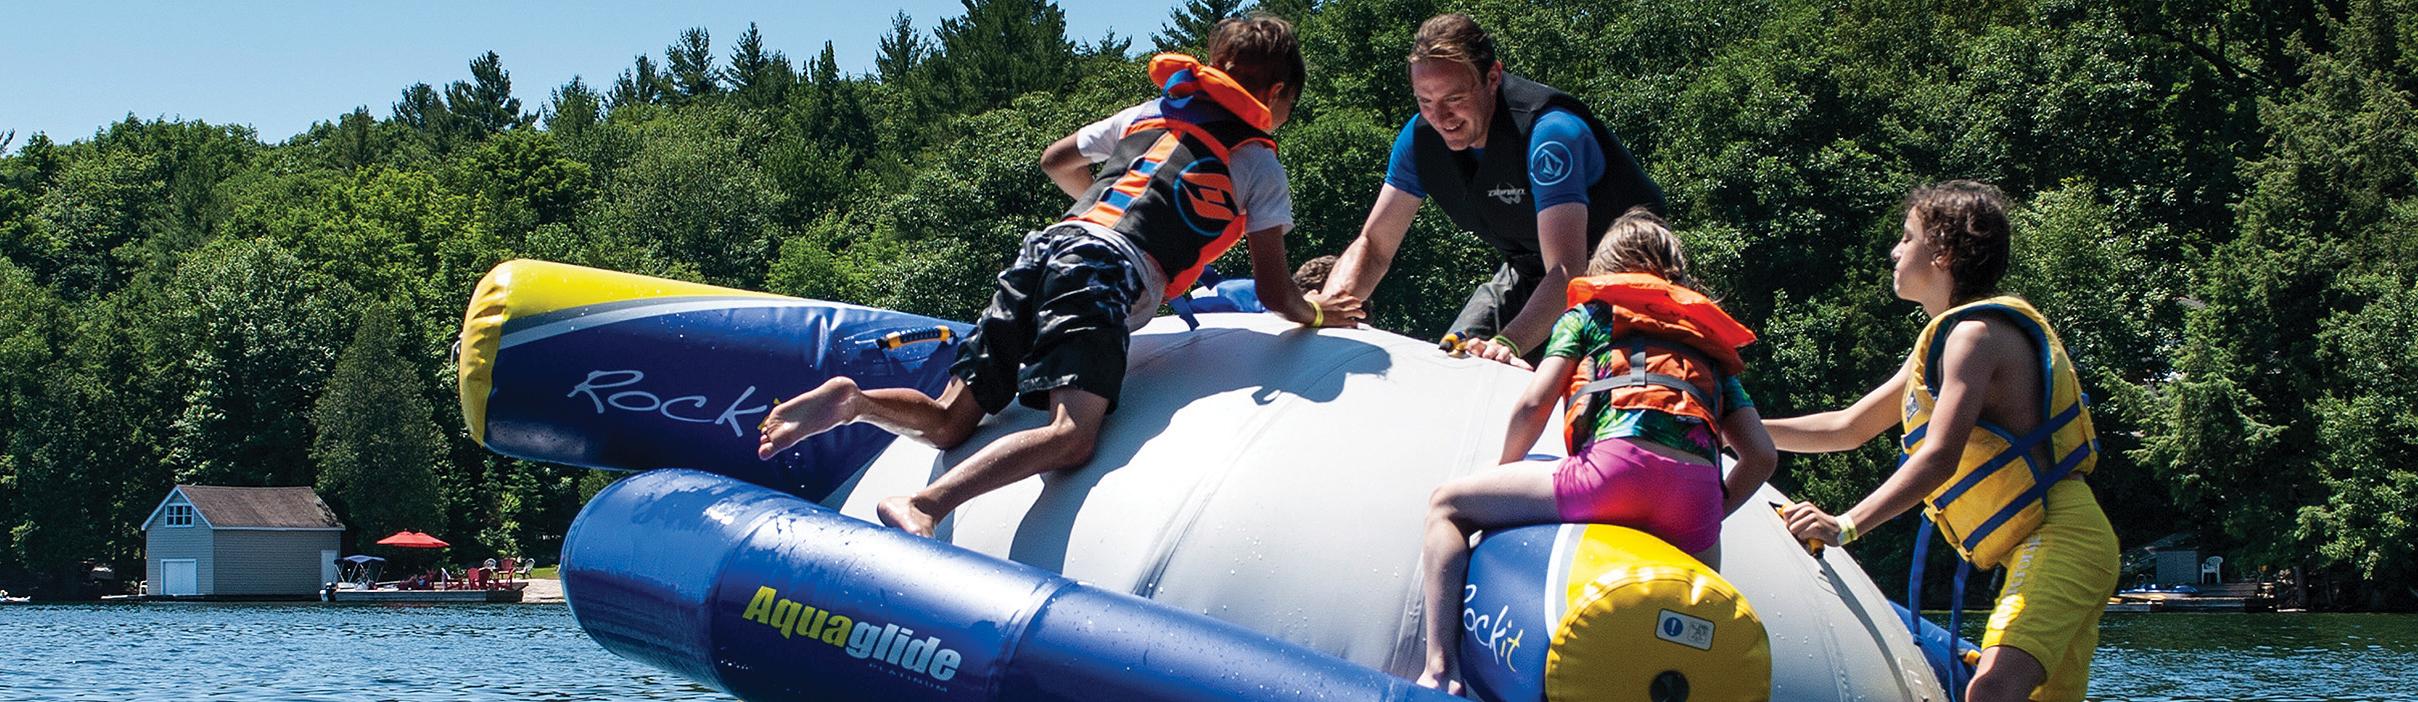 Rocky Crest Water Fun